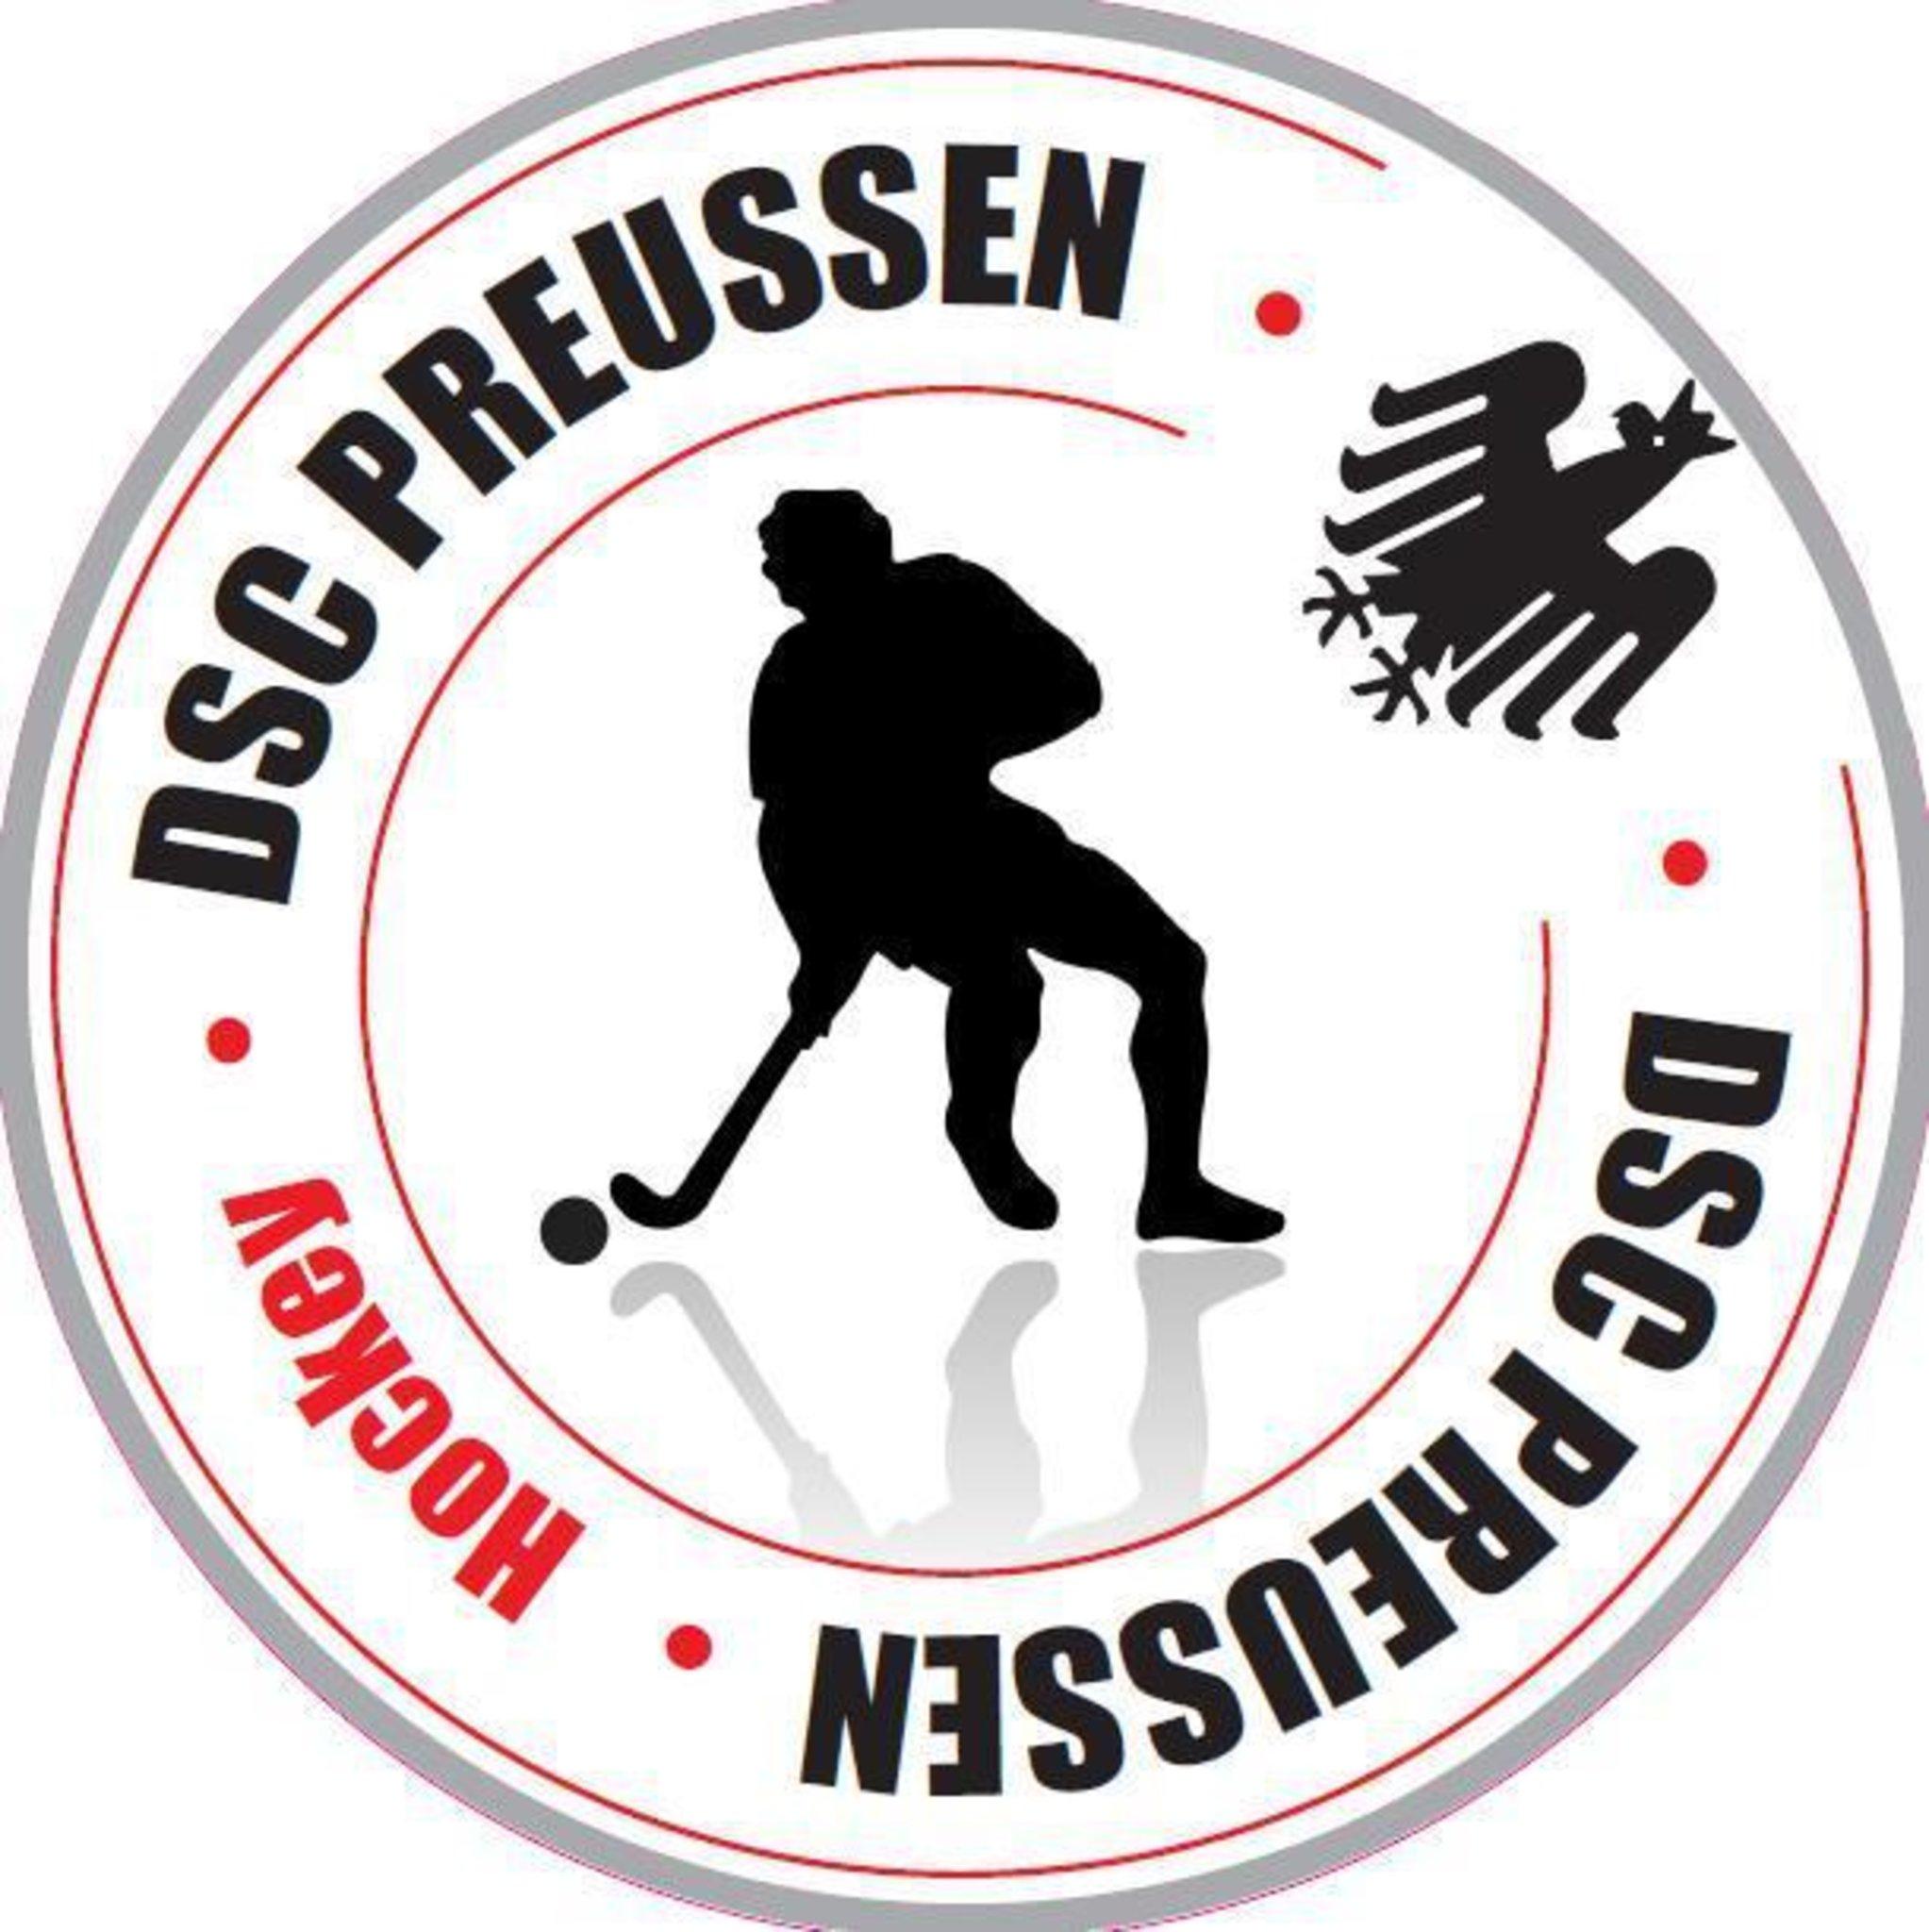 Preußen Duisburg